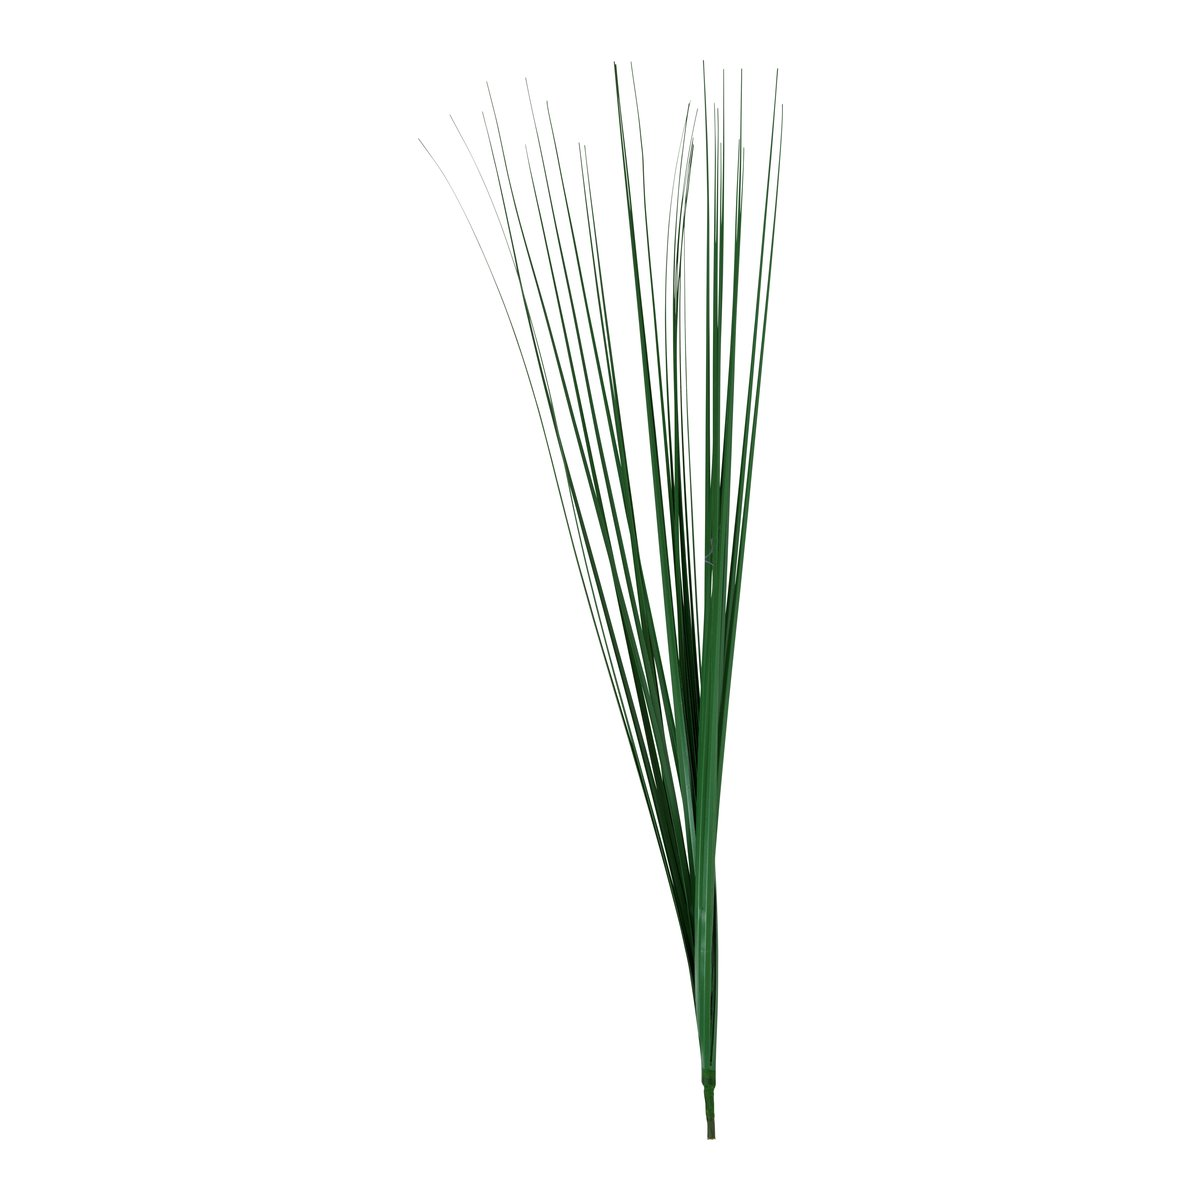 Kunstig gress-BLO1118